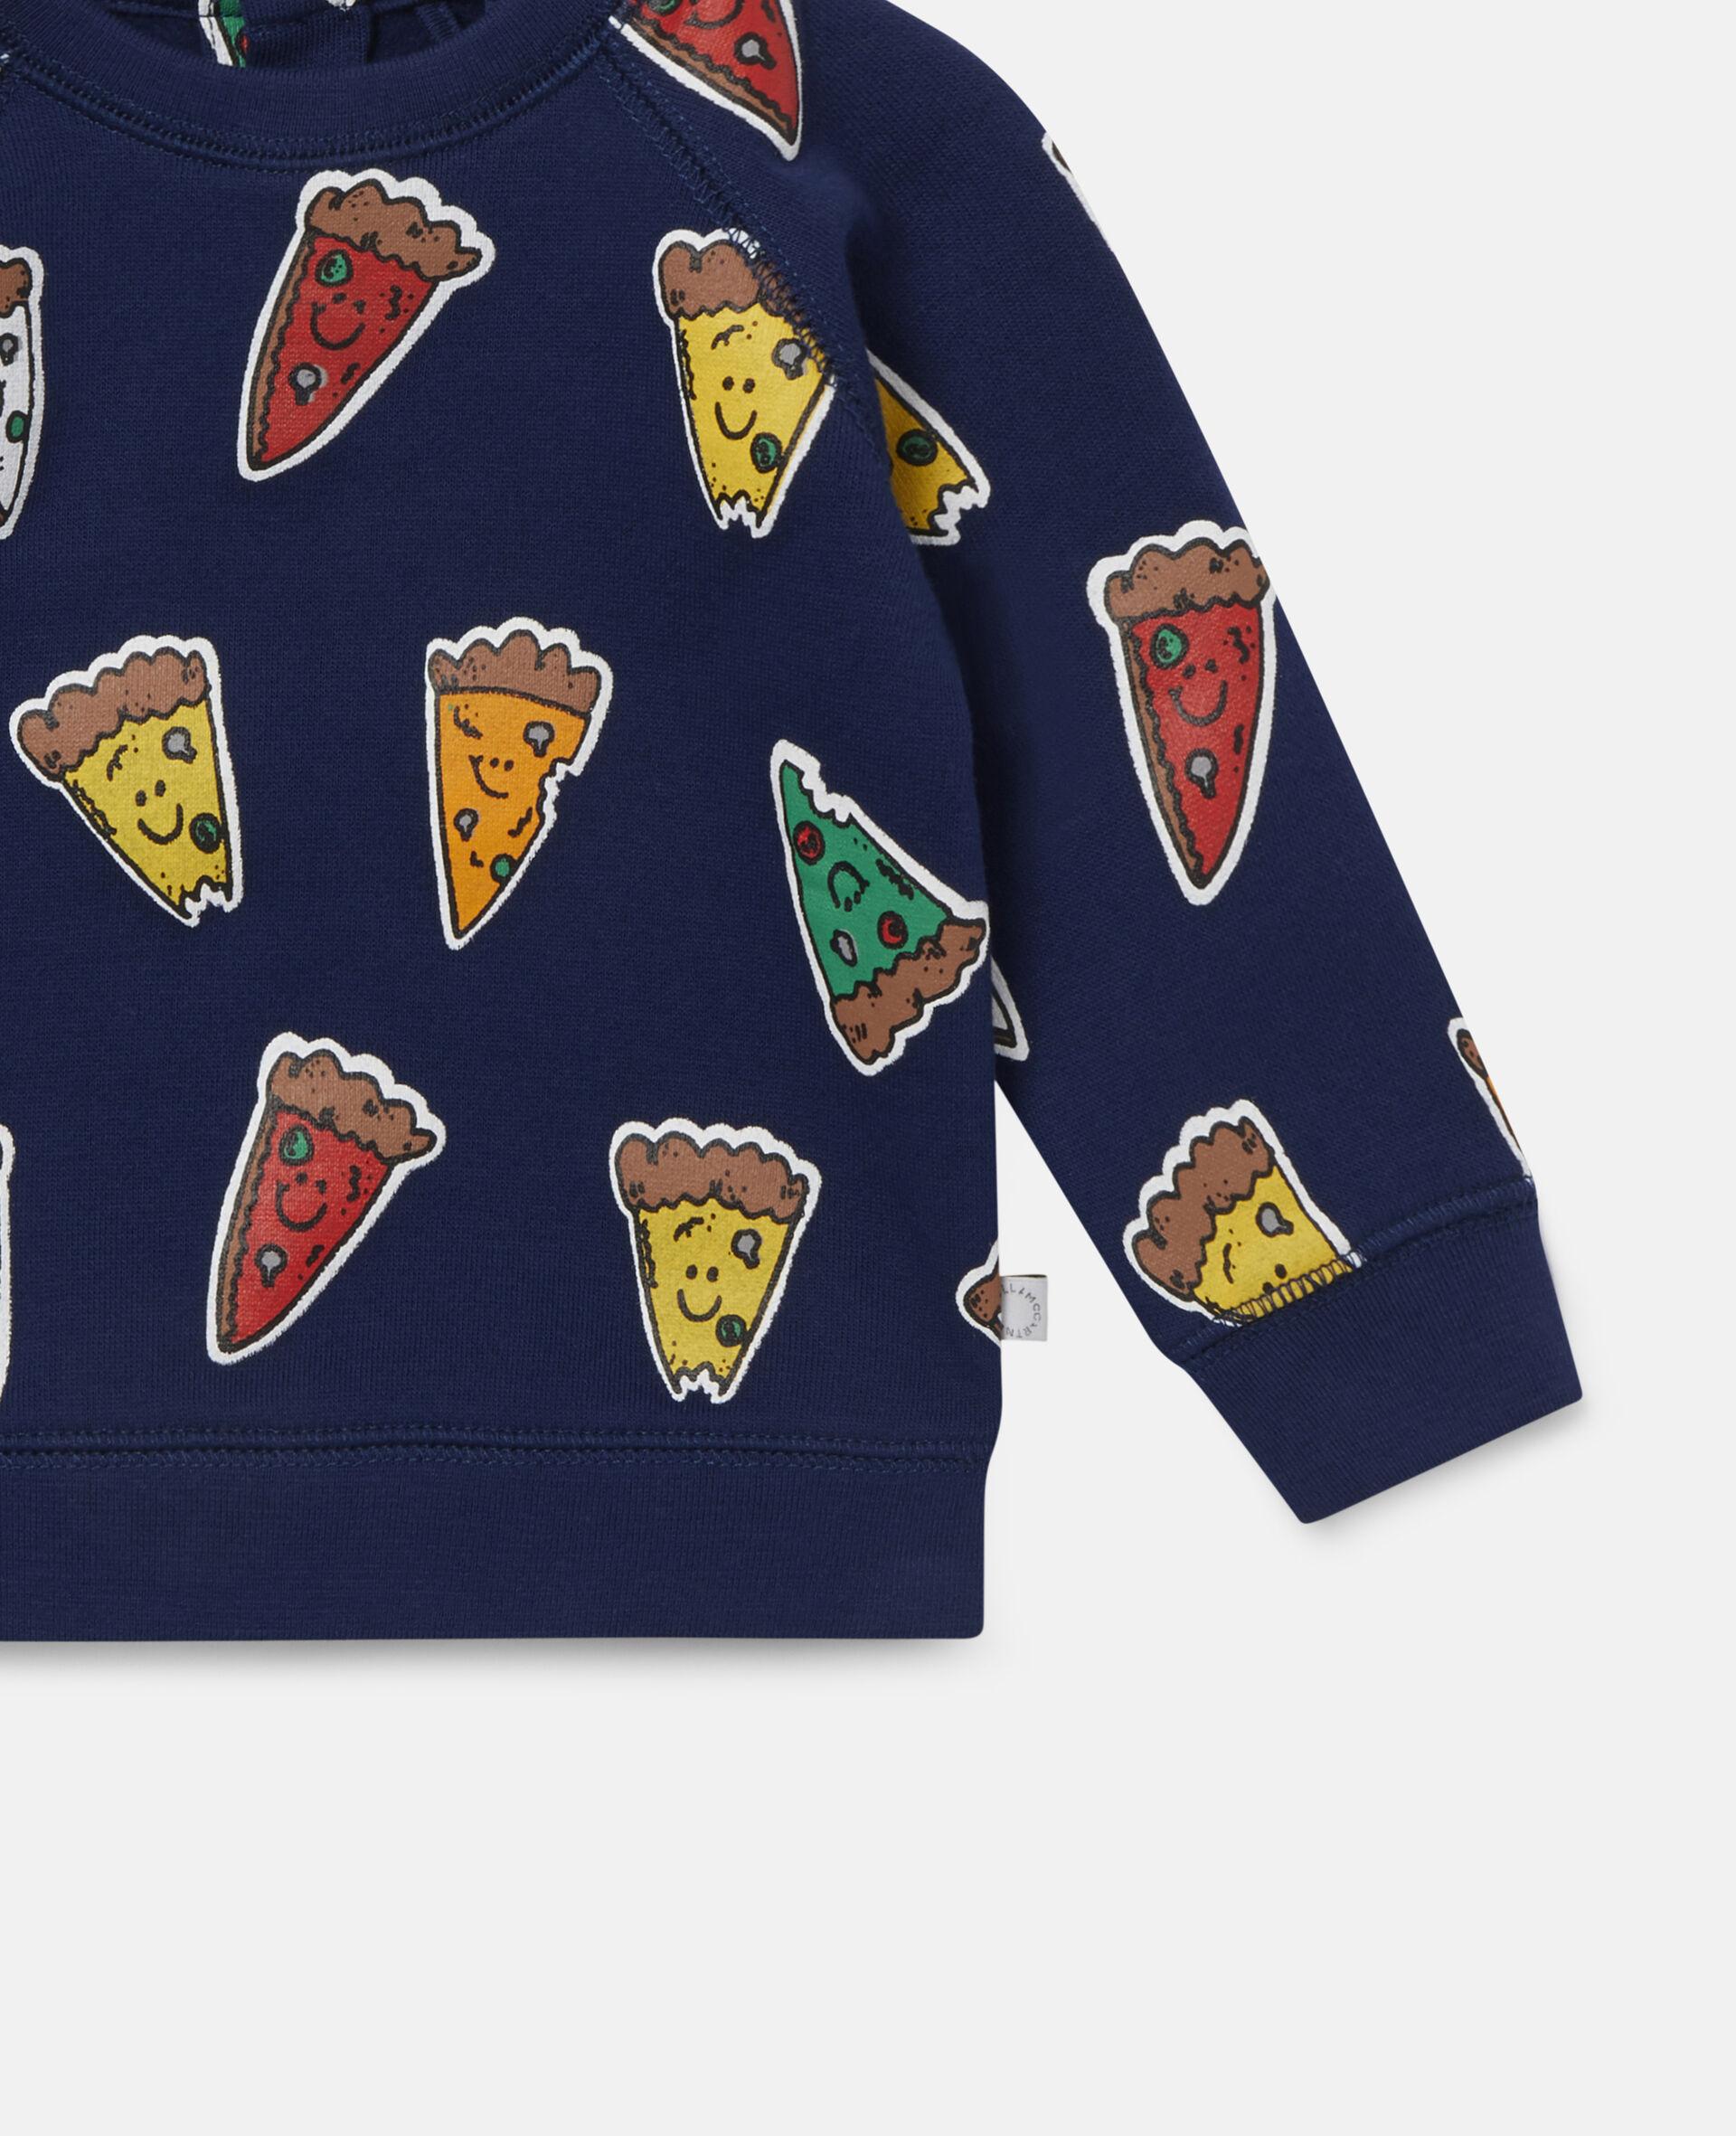 Pizzas Fleece Sweatshirt-Blue-large image number 2